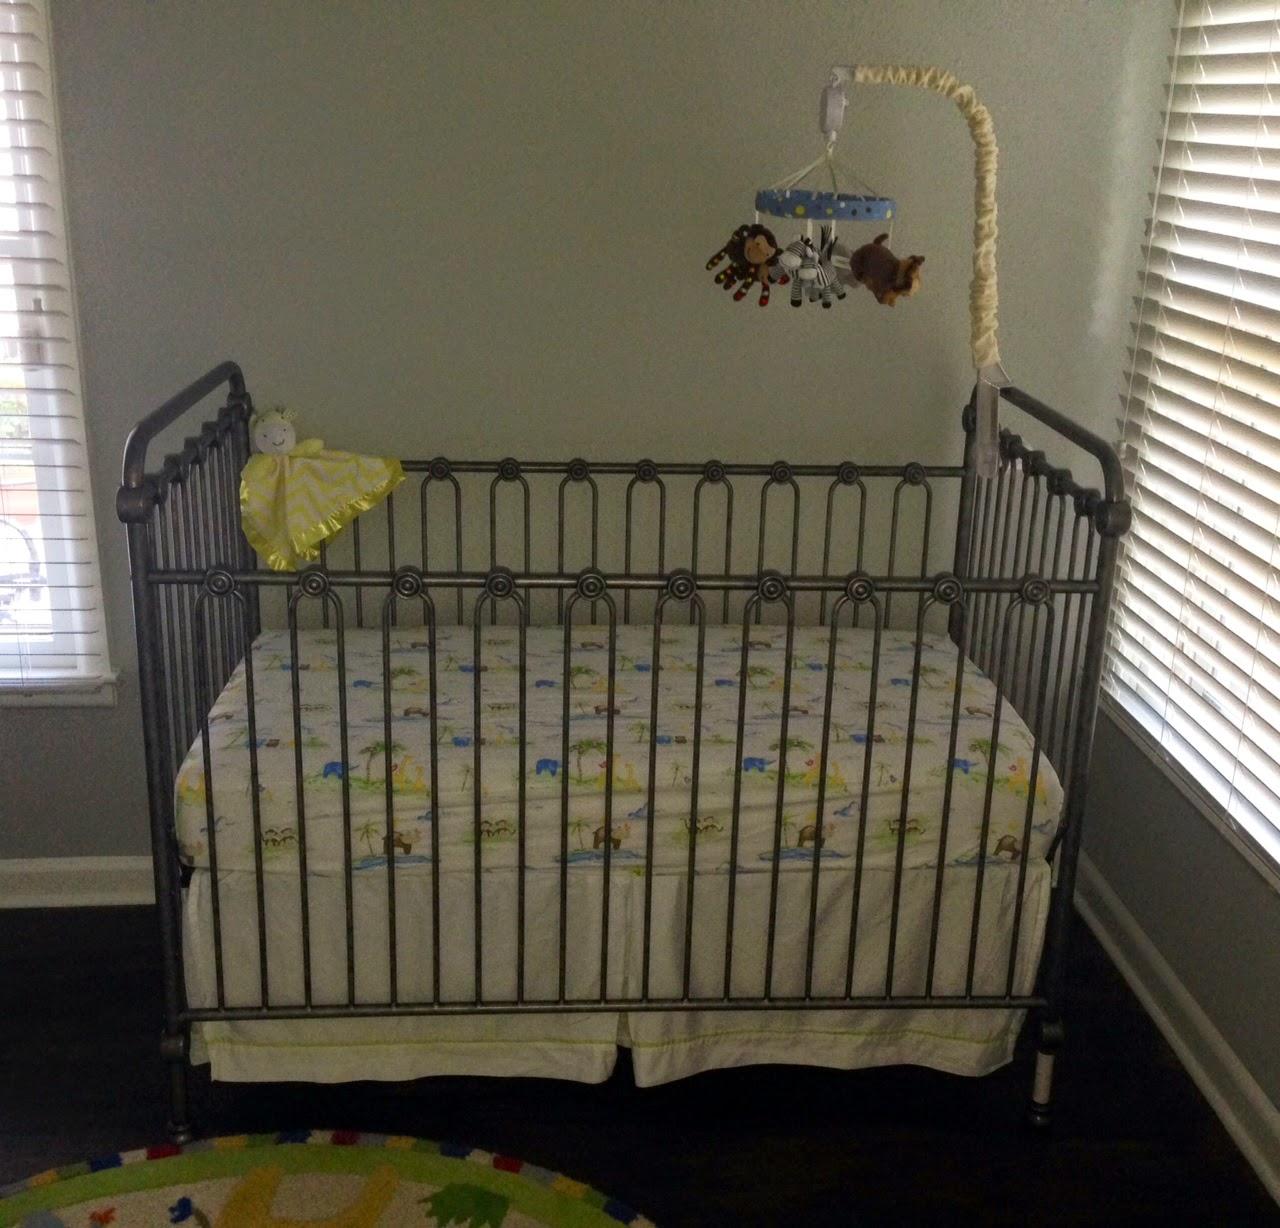 Crib mobile babies r us - Pewter Wrought Iron Crib Bratt Decor Crib Bedding Pottery Barn Kids Musical Safari Mobile Babies R Us